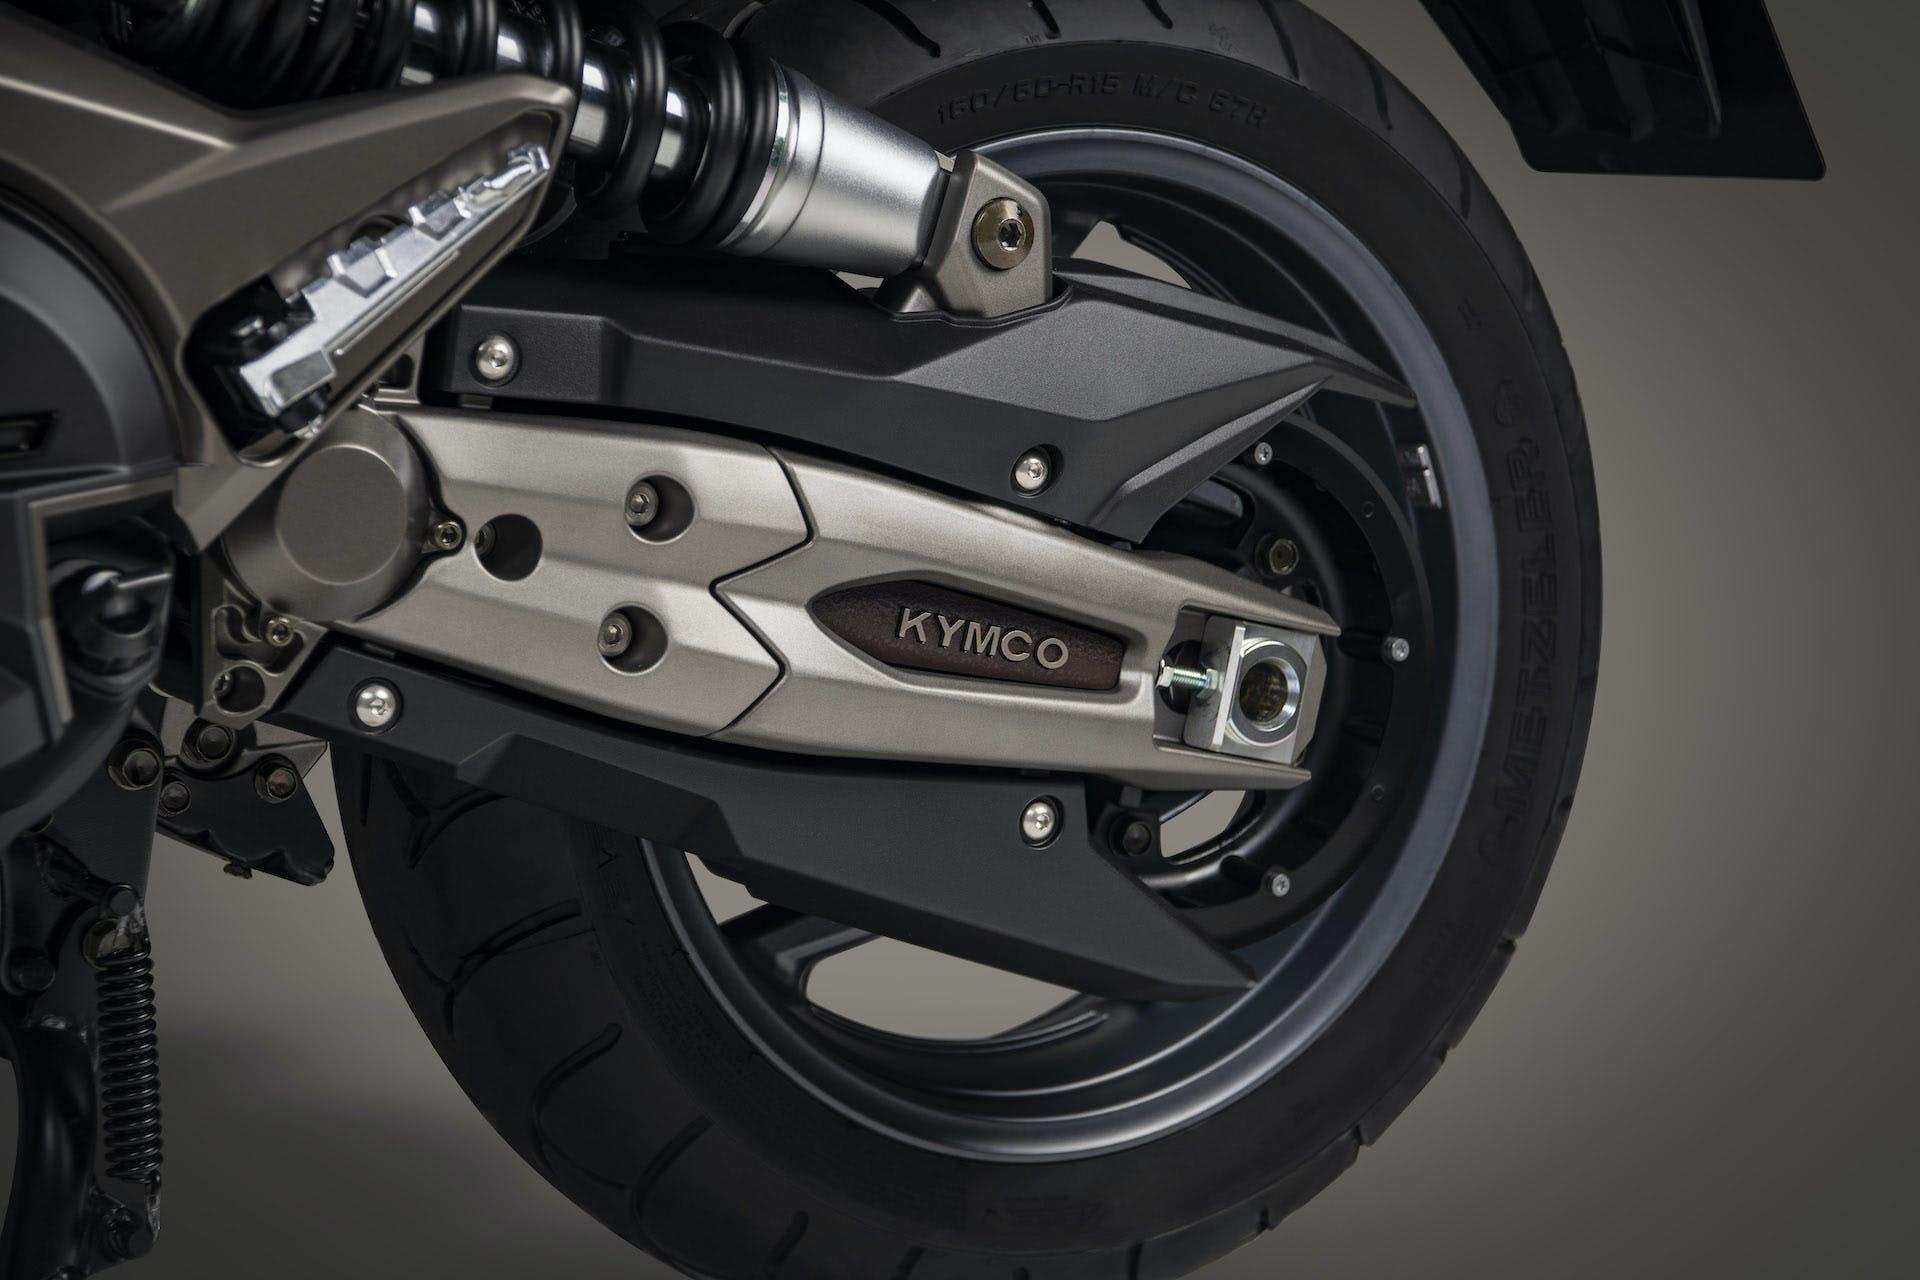 Kymco AK 550 ETS particolare forcellone